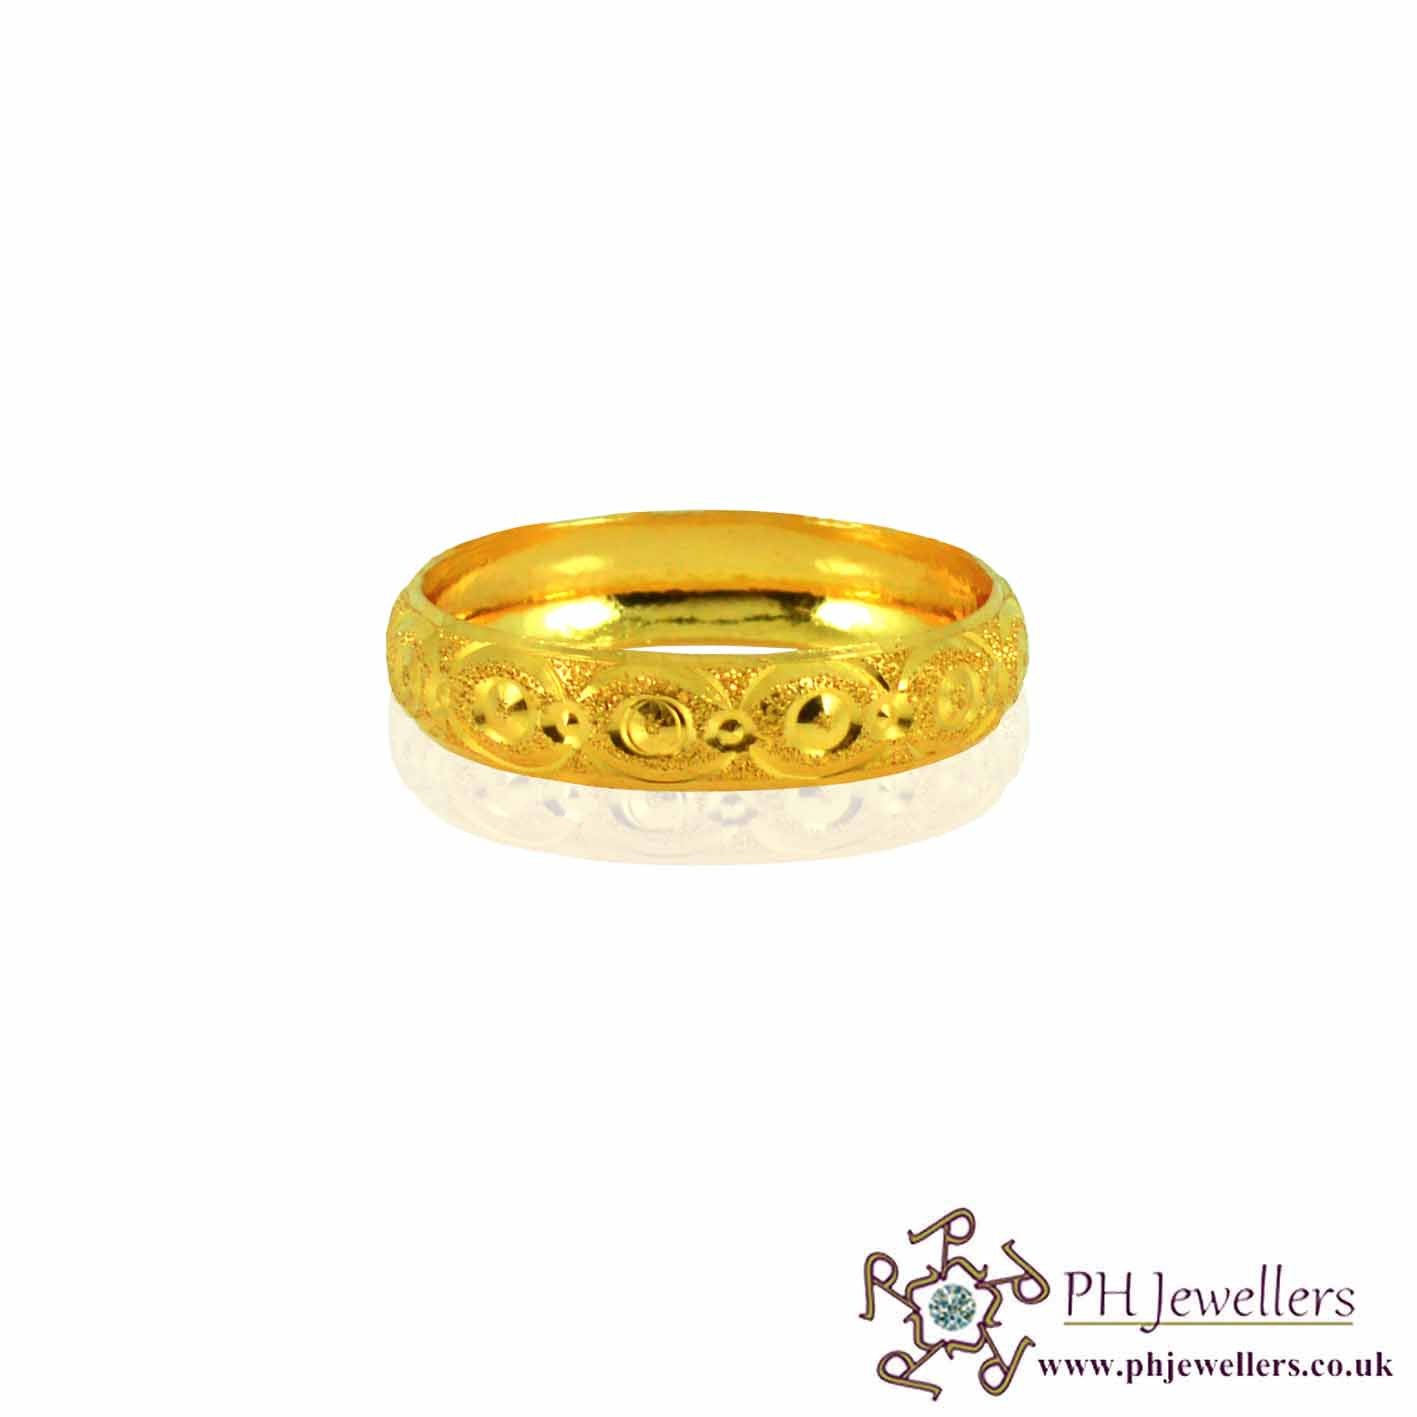 Online Gold Jewellery Gold Jewellery Wedding Band 22ct 916 Hallmark